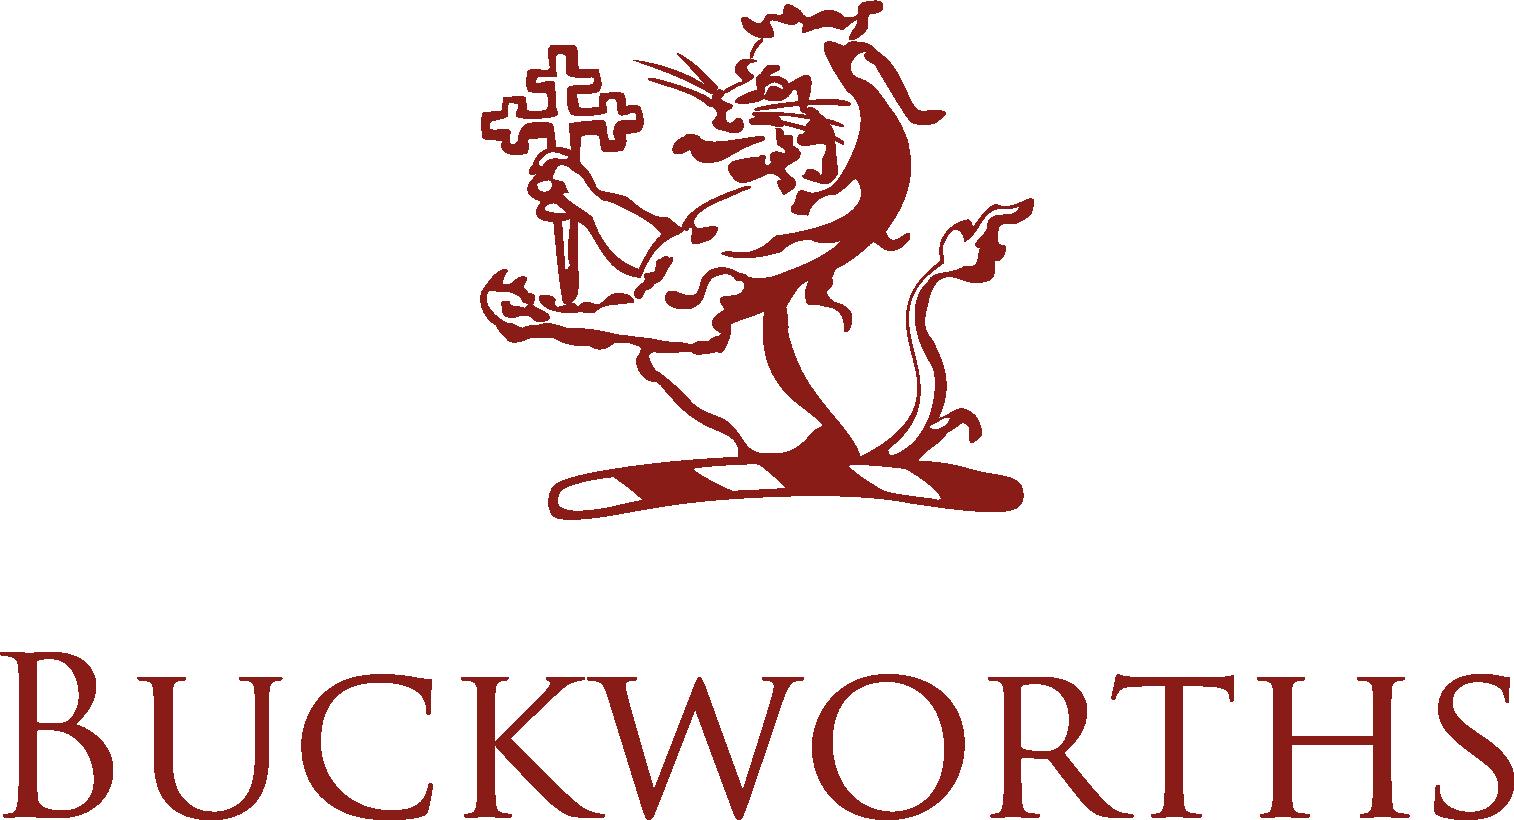 Buckworths